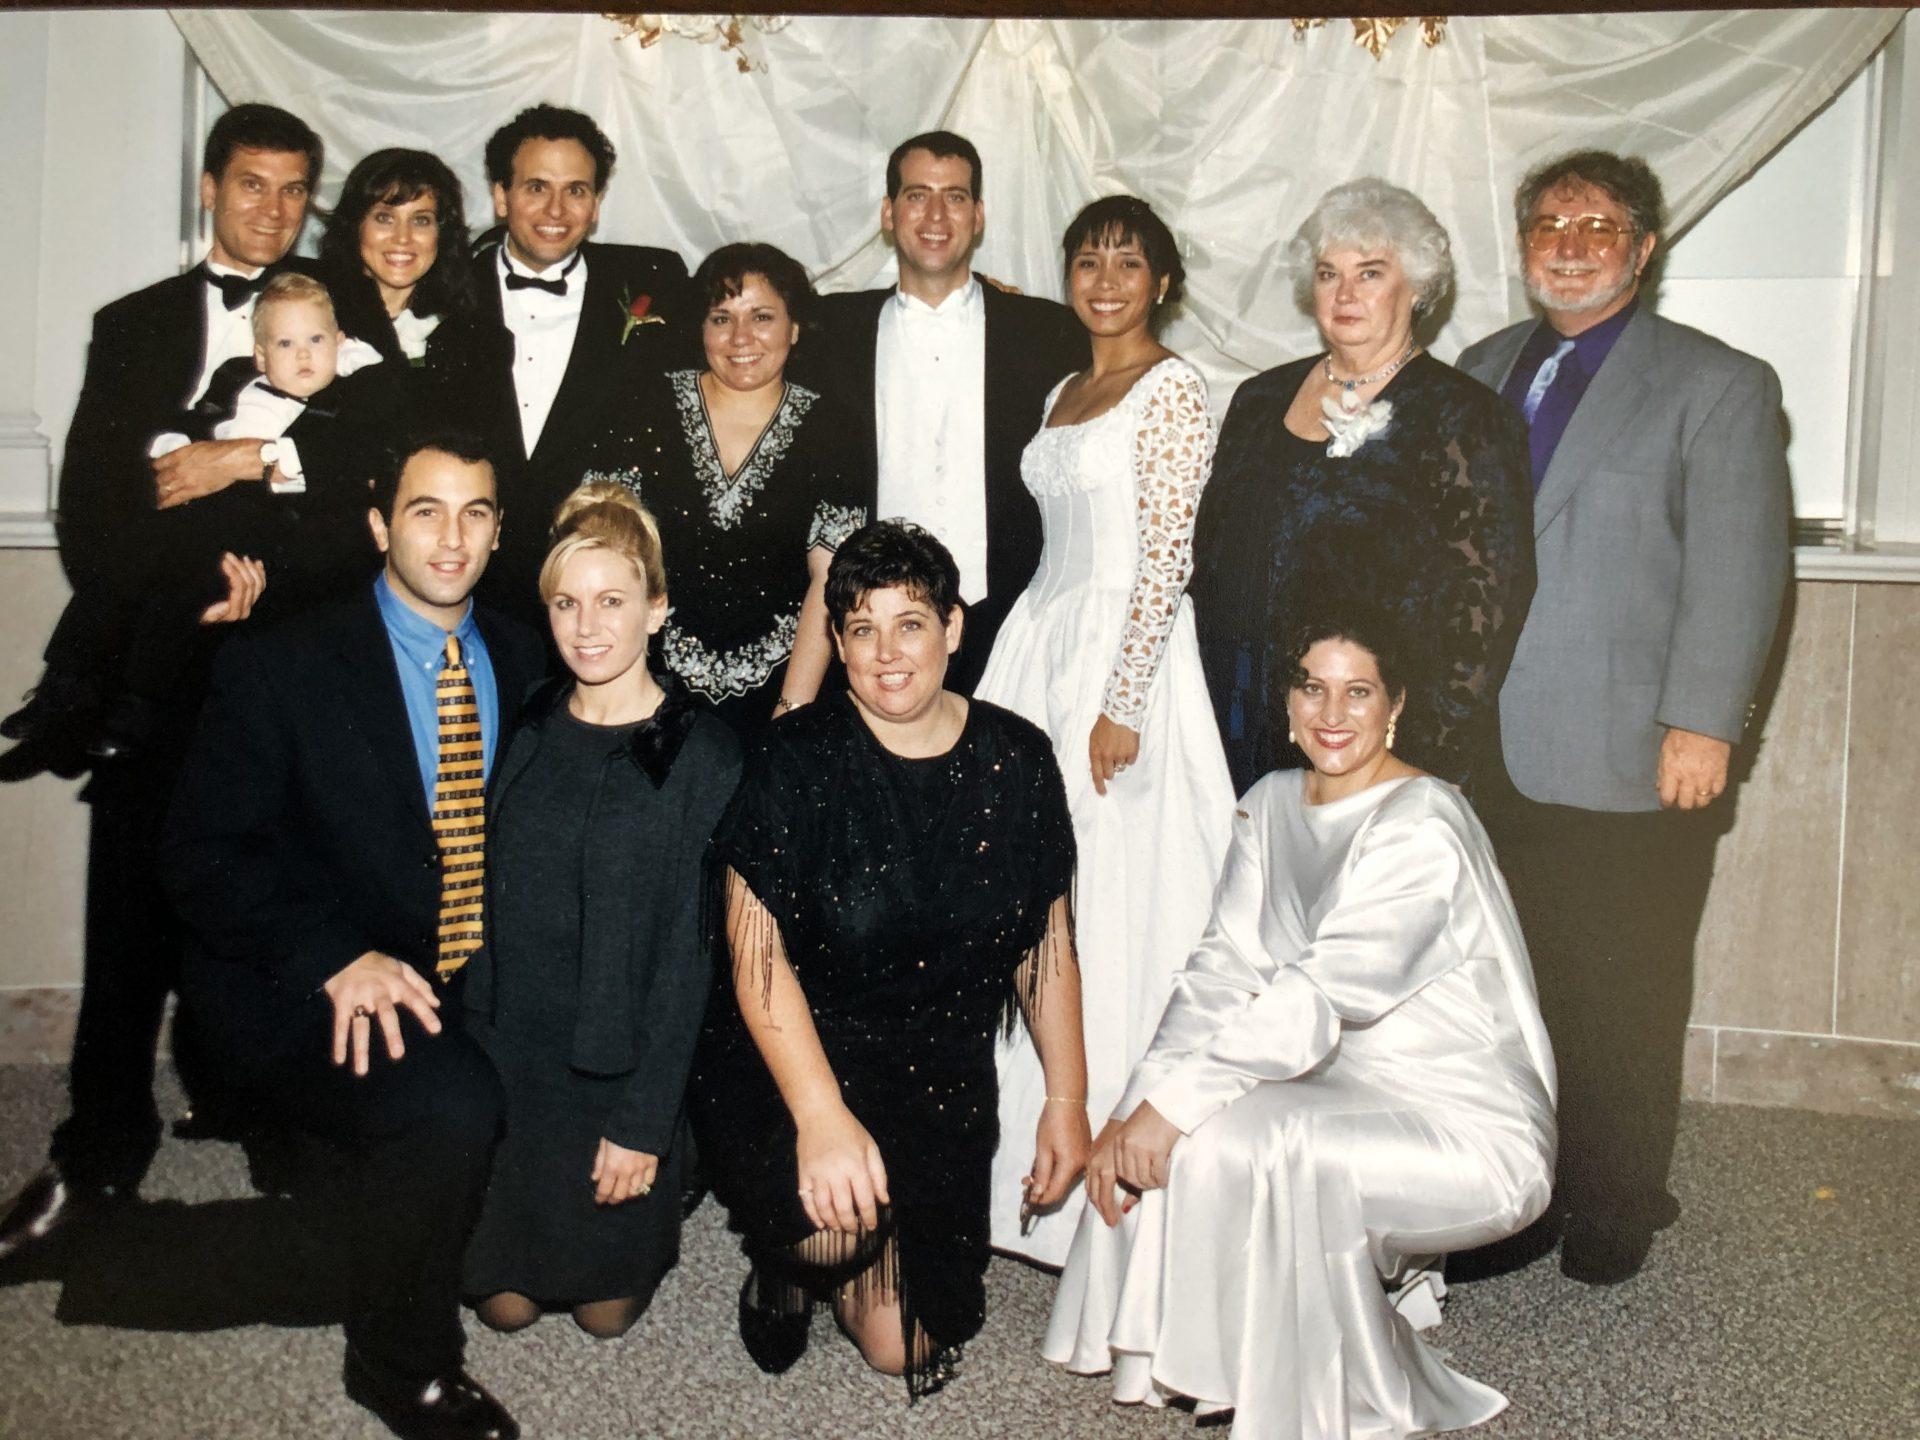 Mom and Paul's wedding